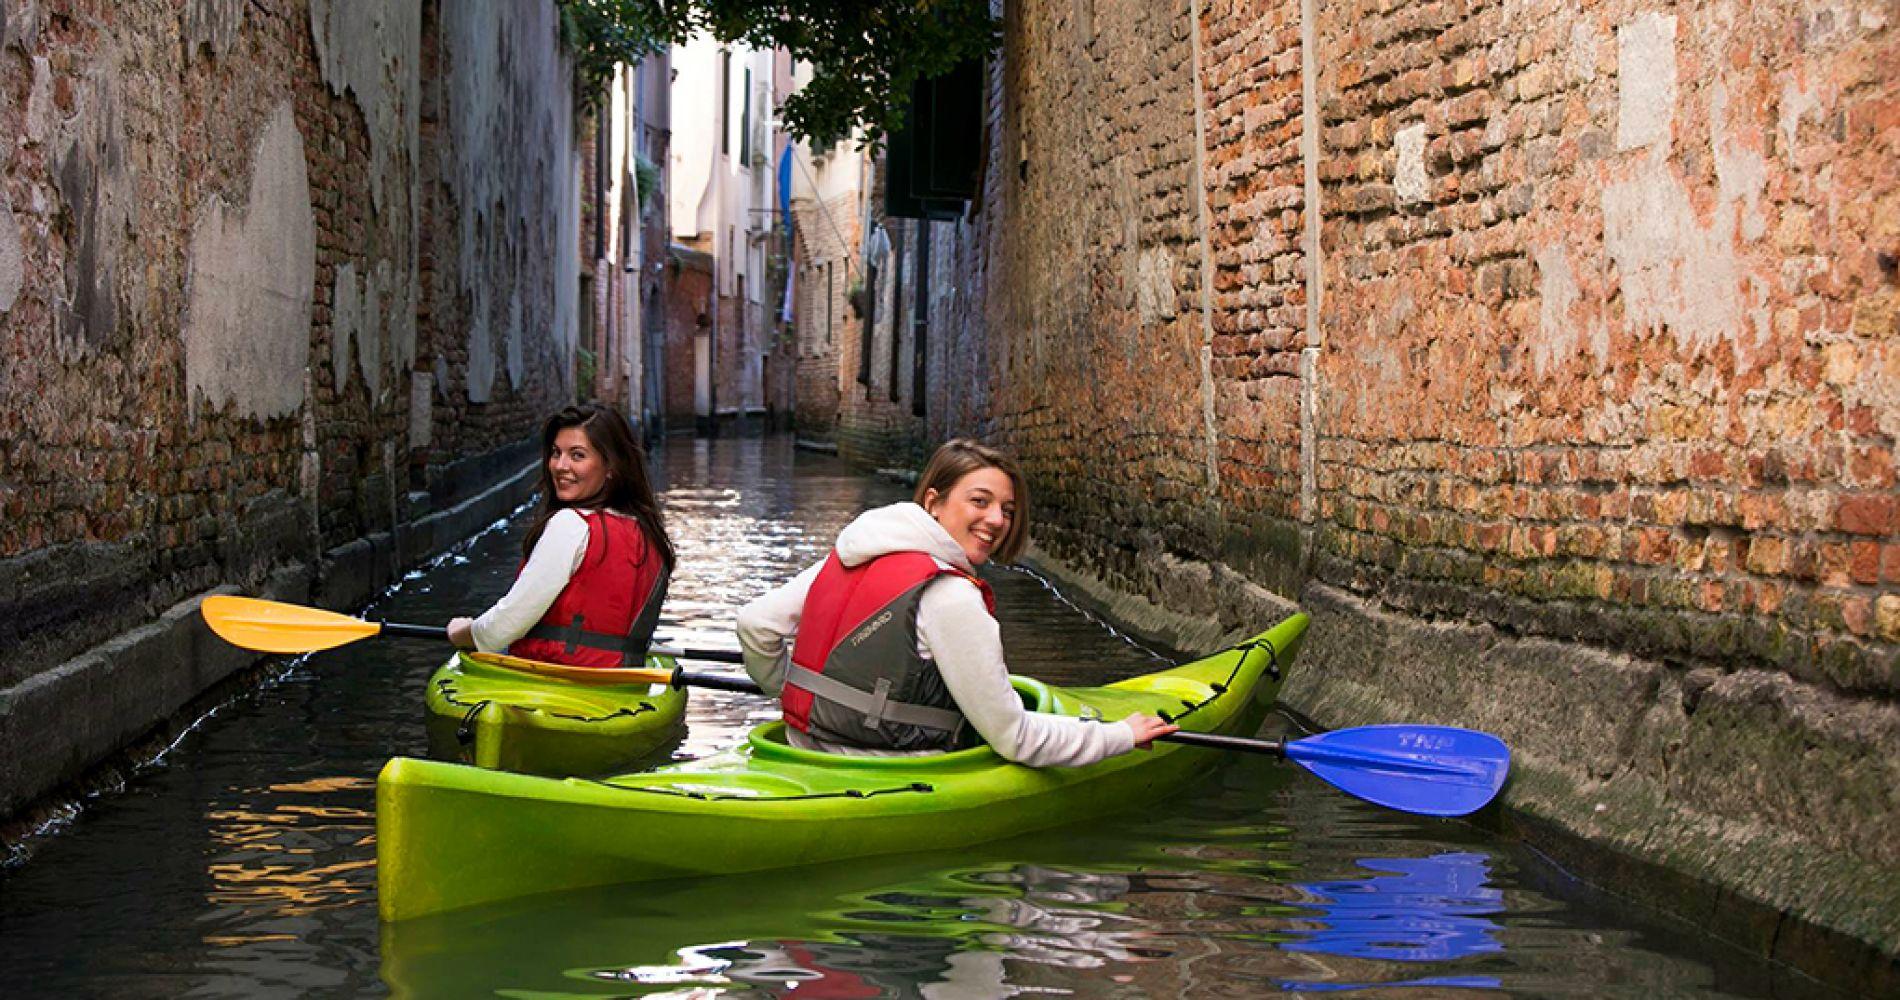 explore venice italy by kayak honeymoon experience